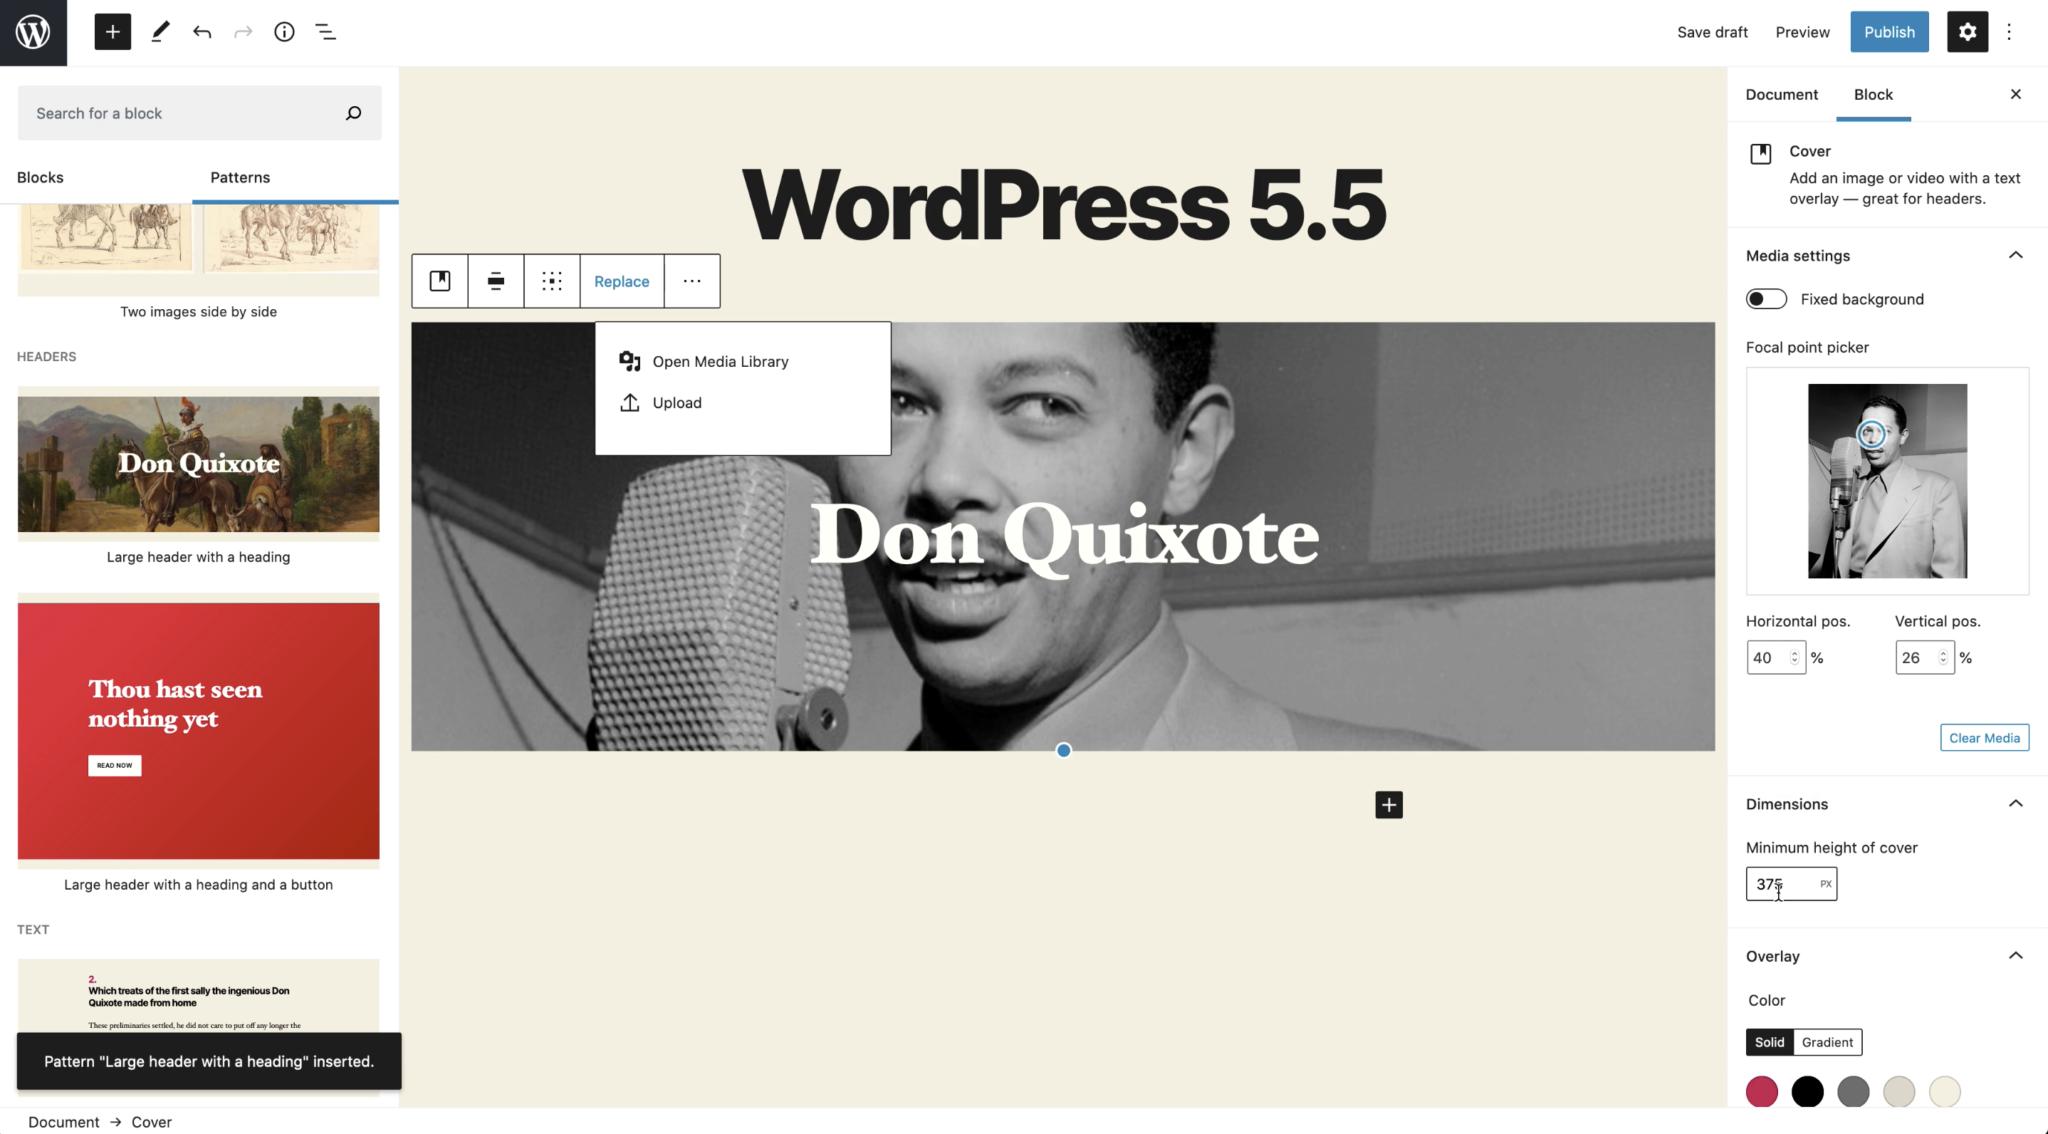 WordPress Patterns